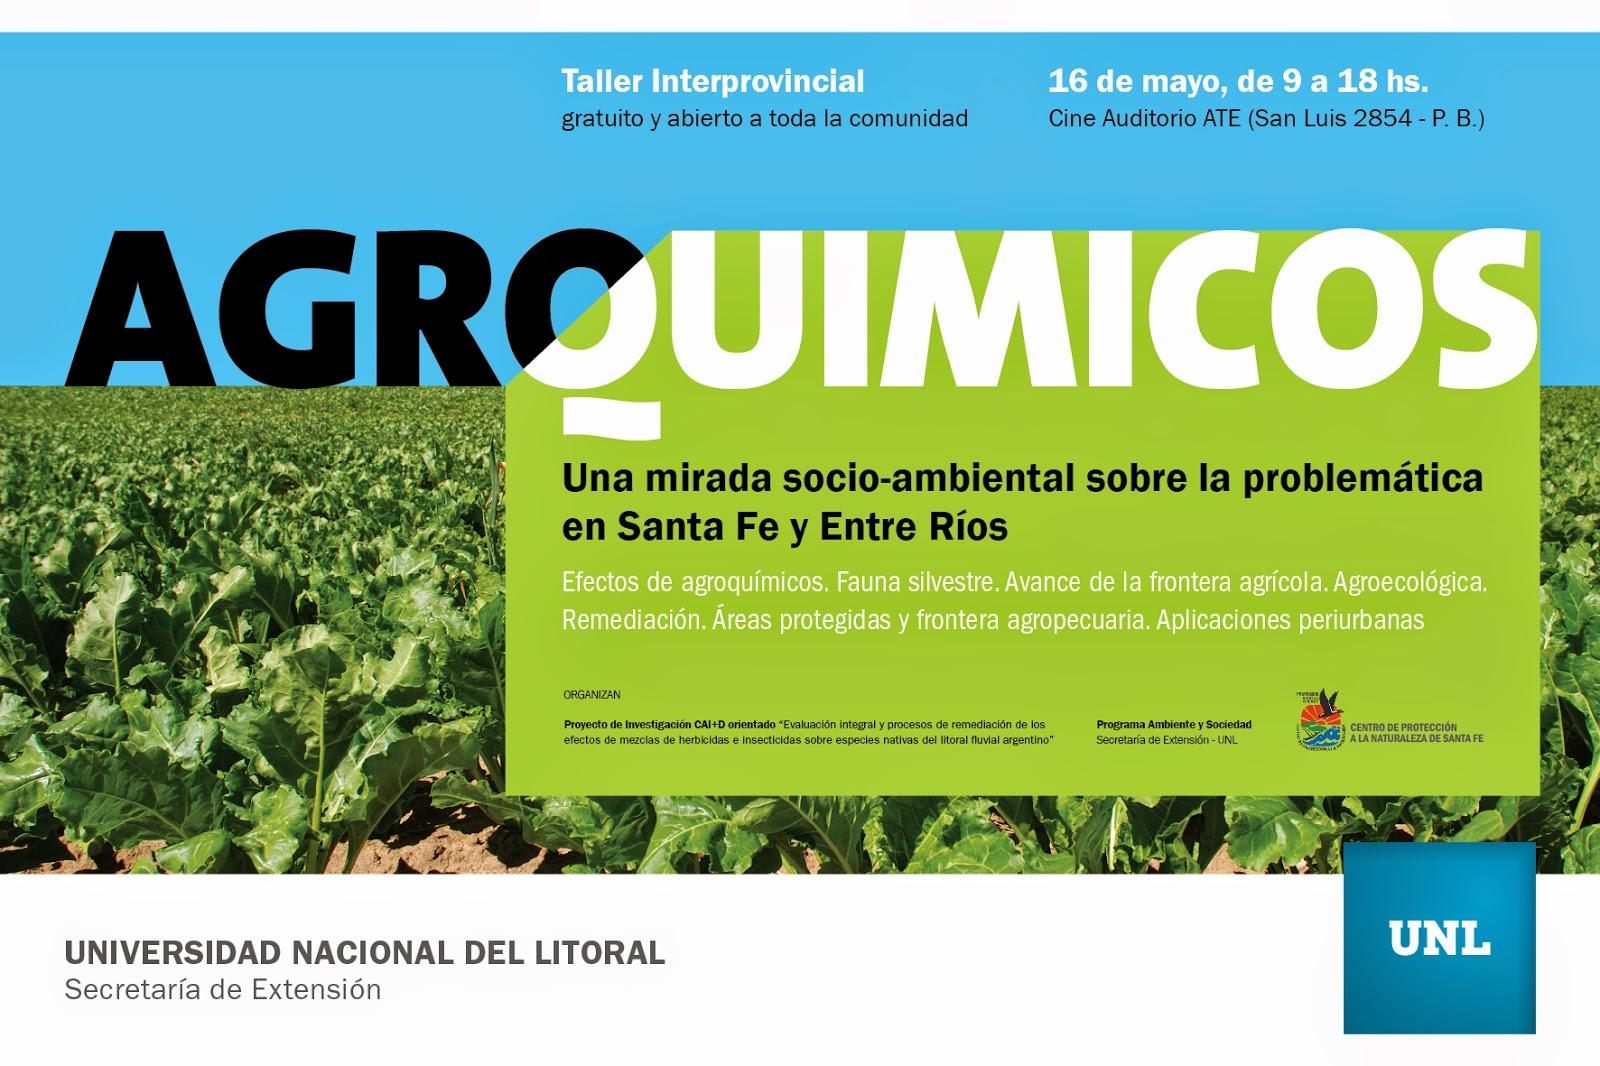 http://www.unl.edu.ar/noticias/news/view/se_desarrolla_el_taller_interprovincial_sobre_agroqu%C3%ADmicos